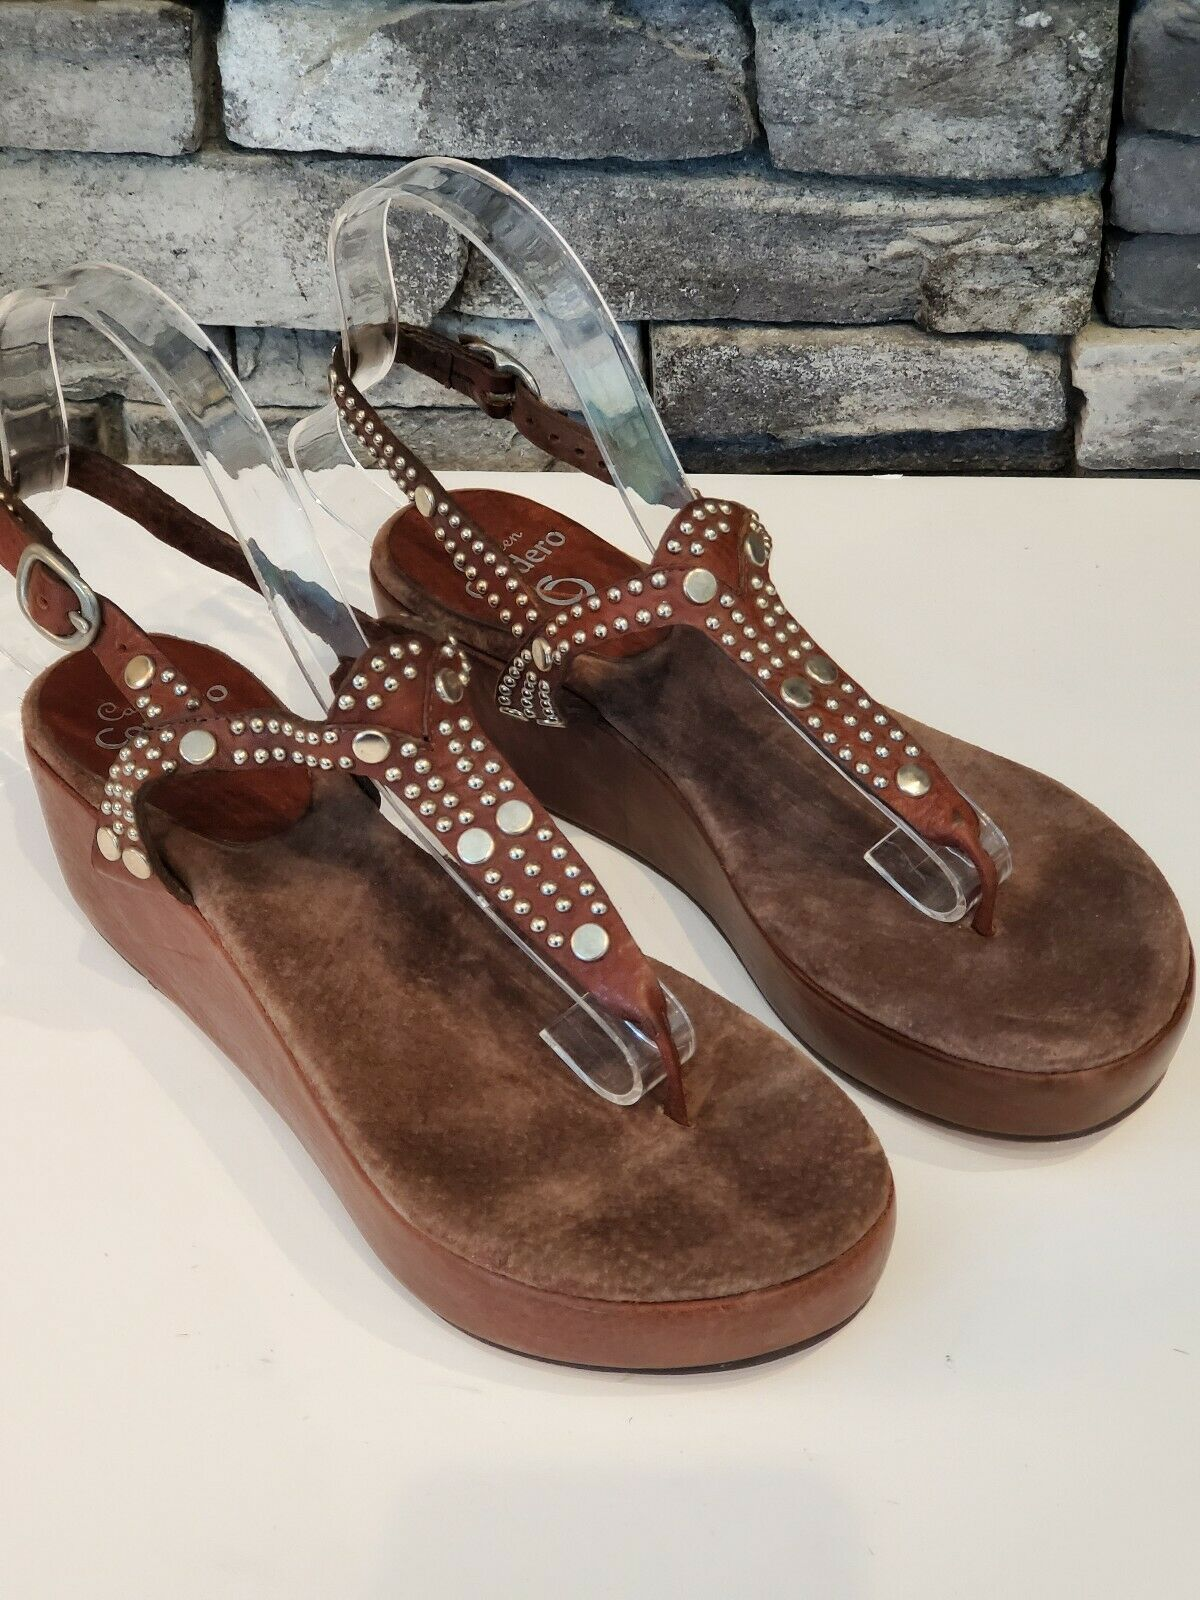 NWOT Calleen Cordero Marronee Leather  argento Studded Wooden Platform Sandal Dimensione 7  wholesape economico